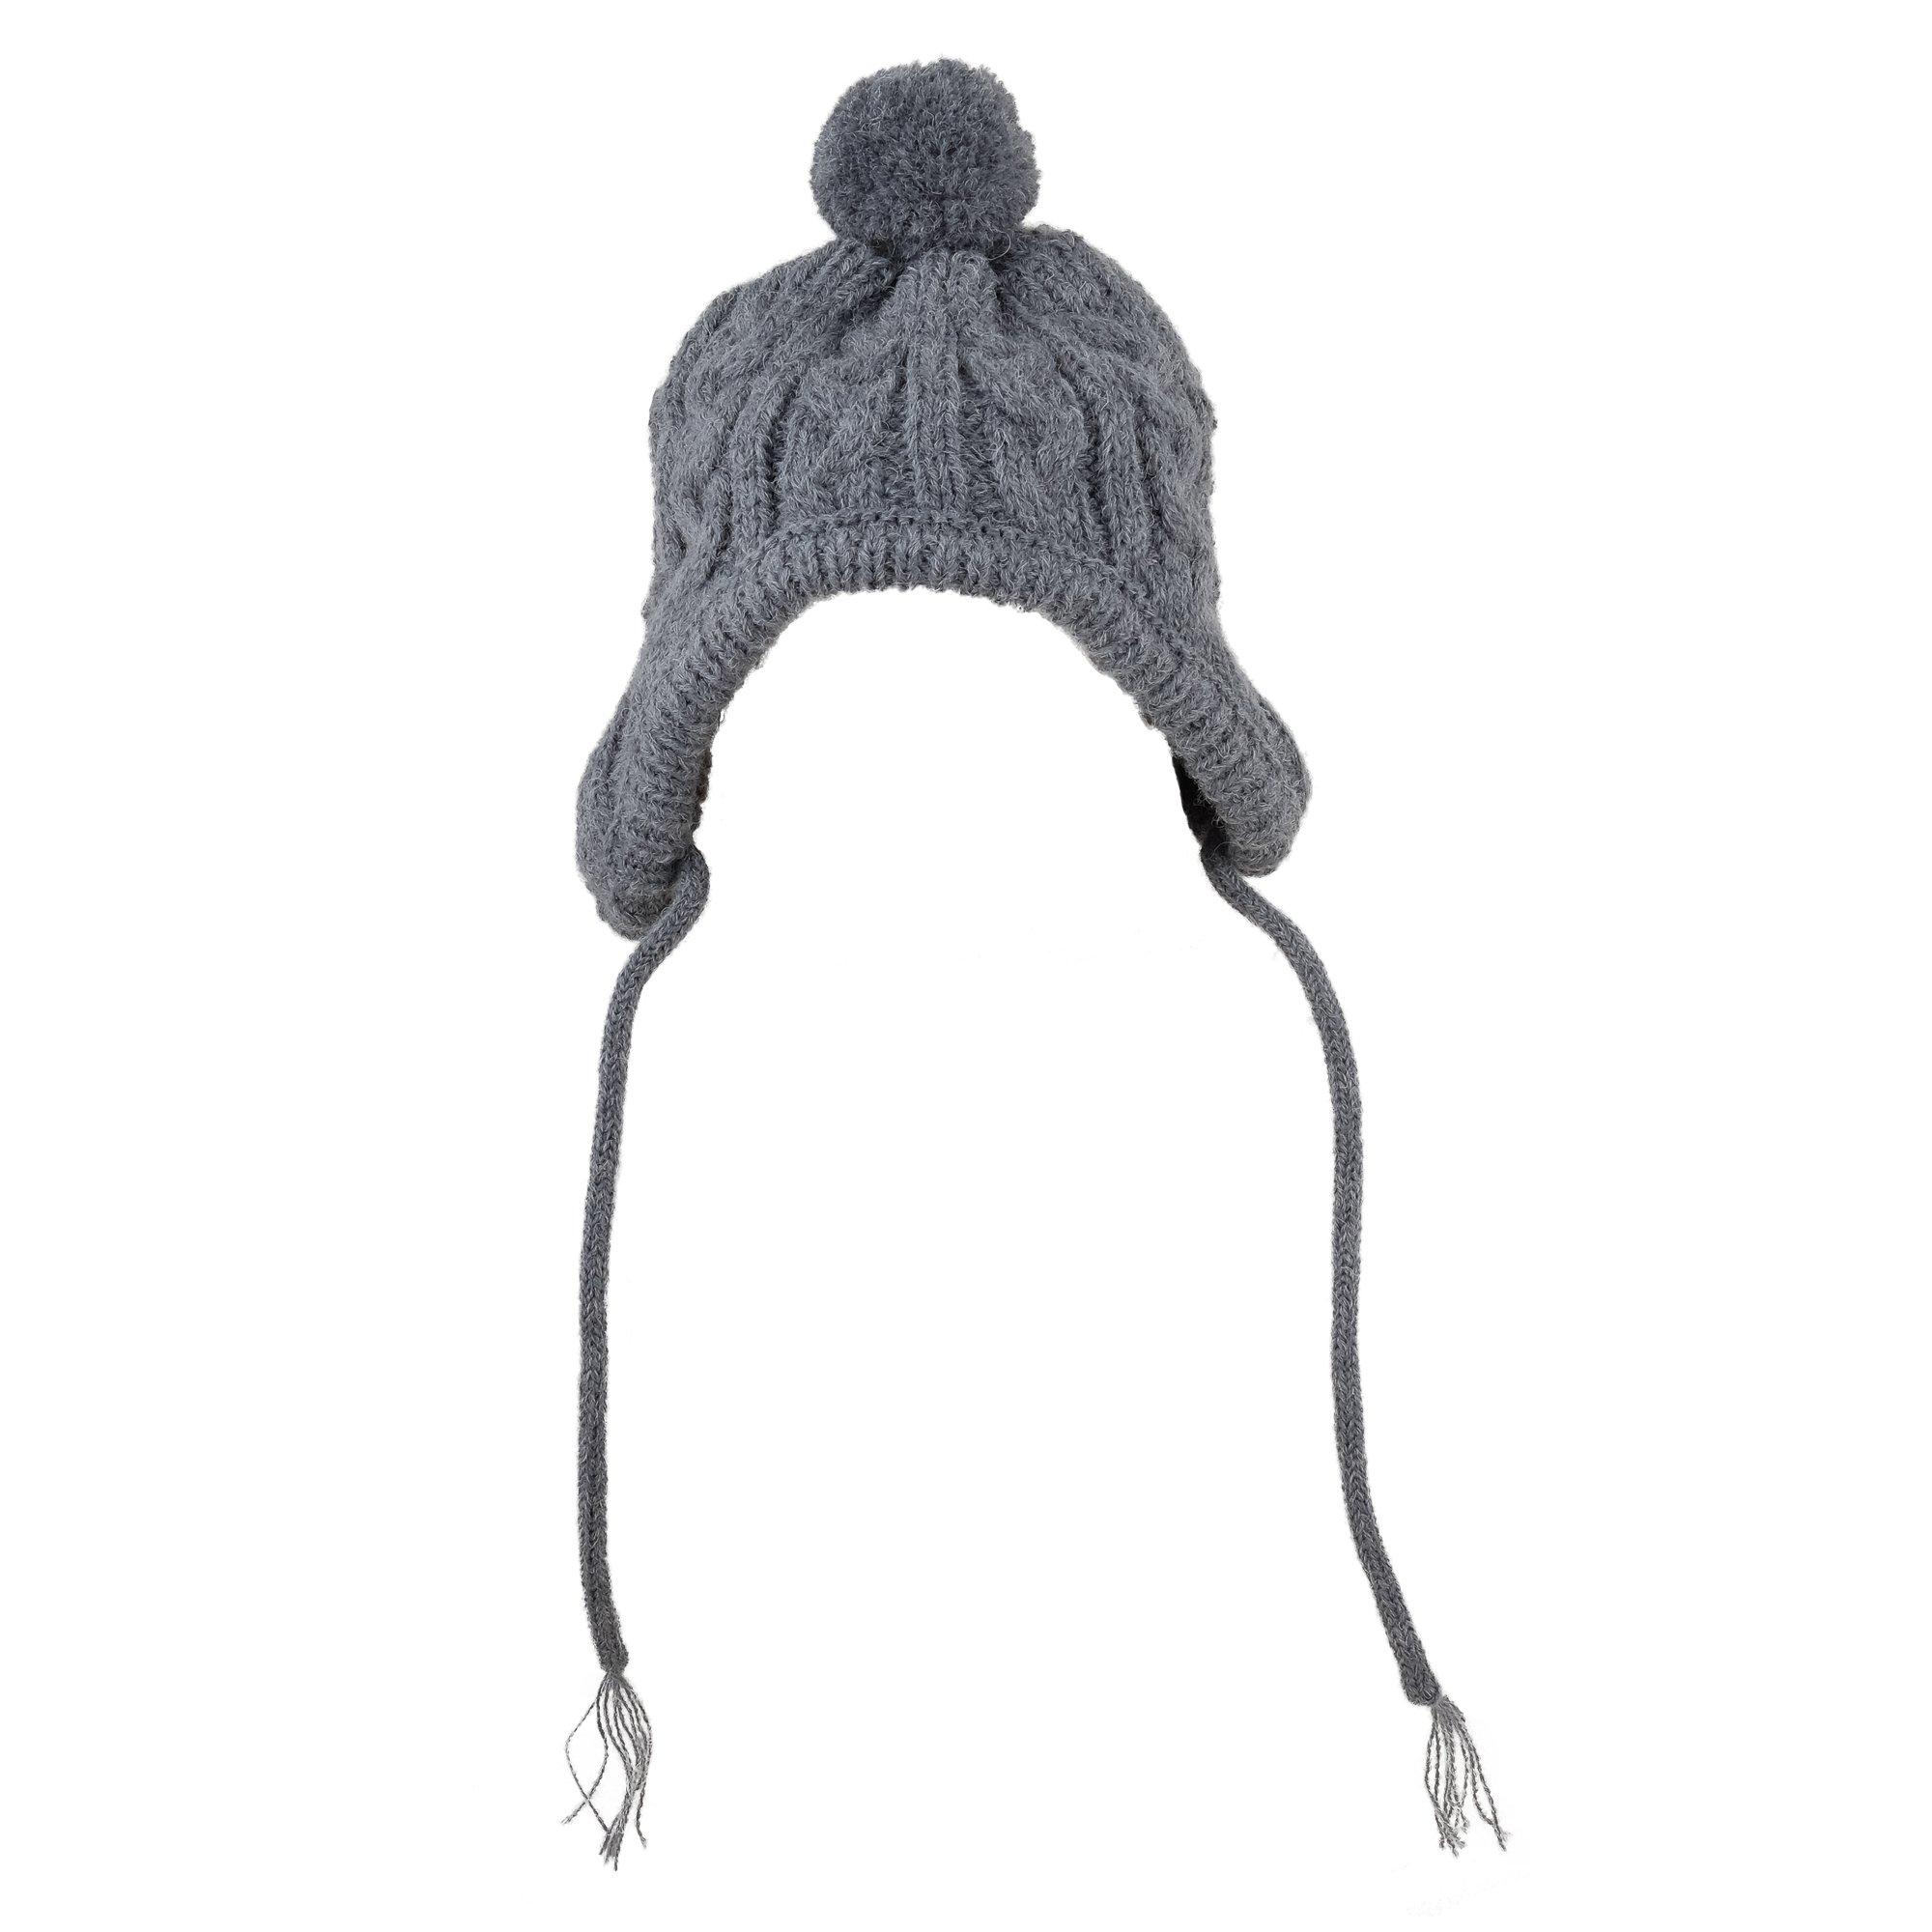 The Worthy Dog 5441 Toboggan Hat, Grey, M